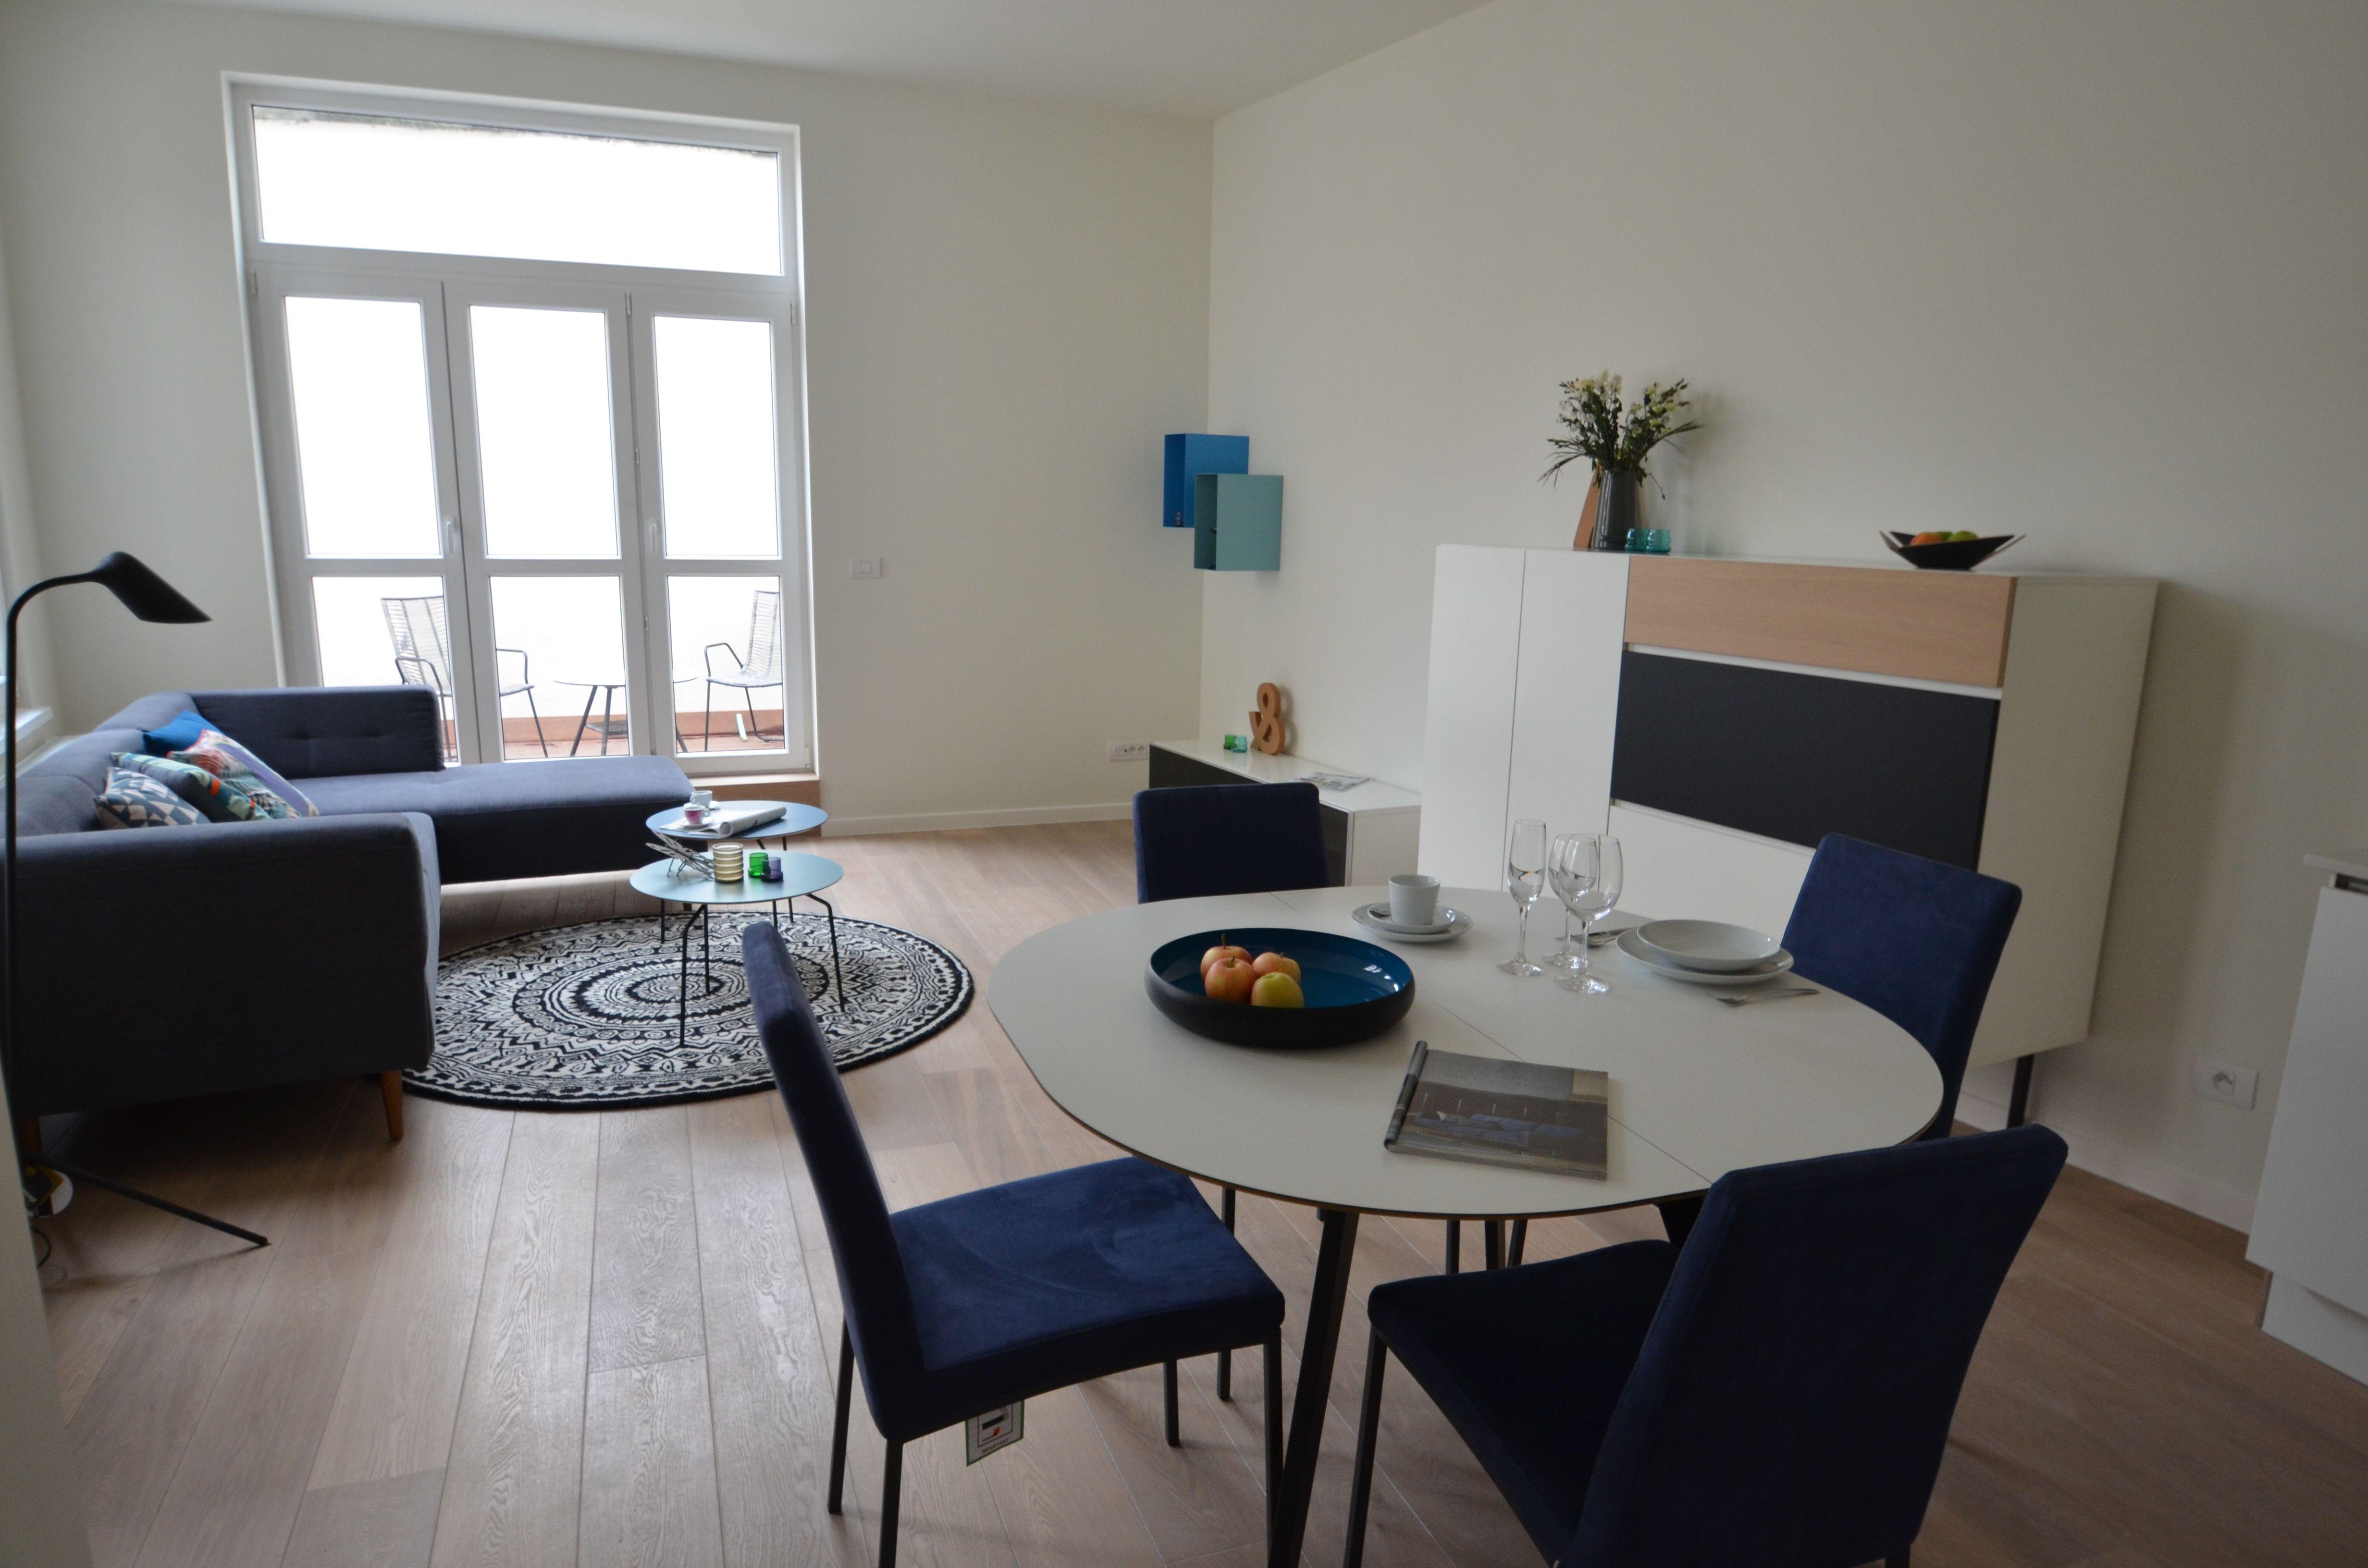 Nico chairs scandinavian dining interior design BoConcept ...